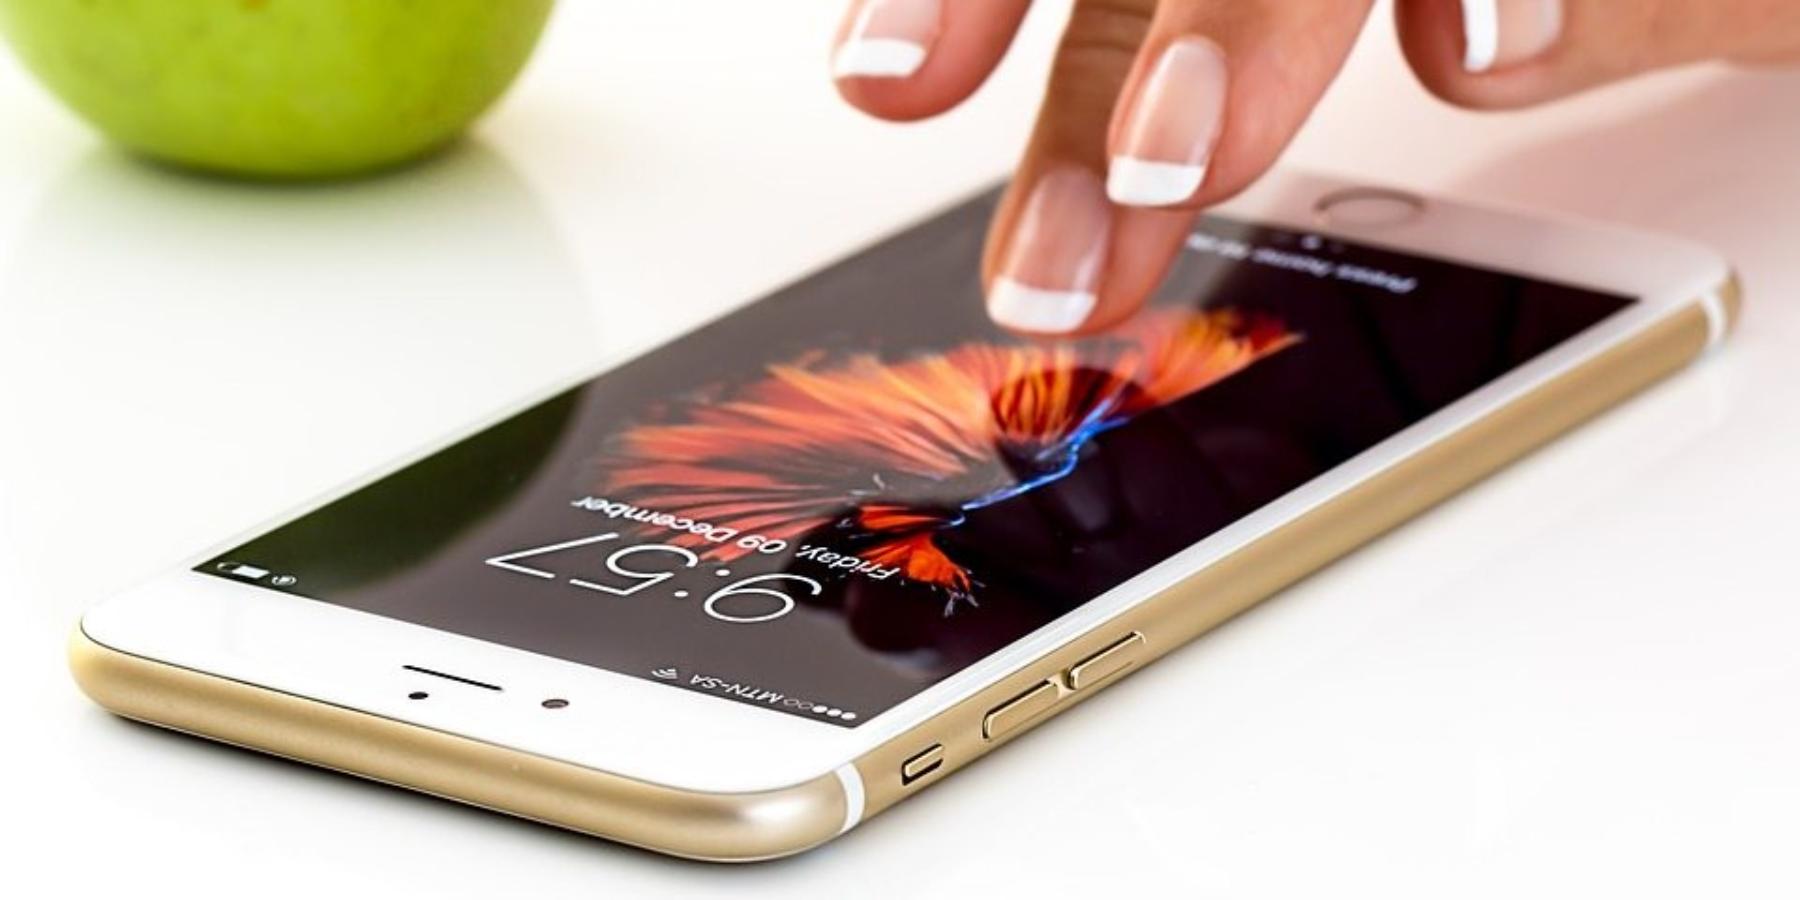 Prasówka e-commerce #70 Apple Pay niedługo zadebiutuje wPolsce